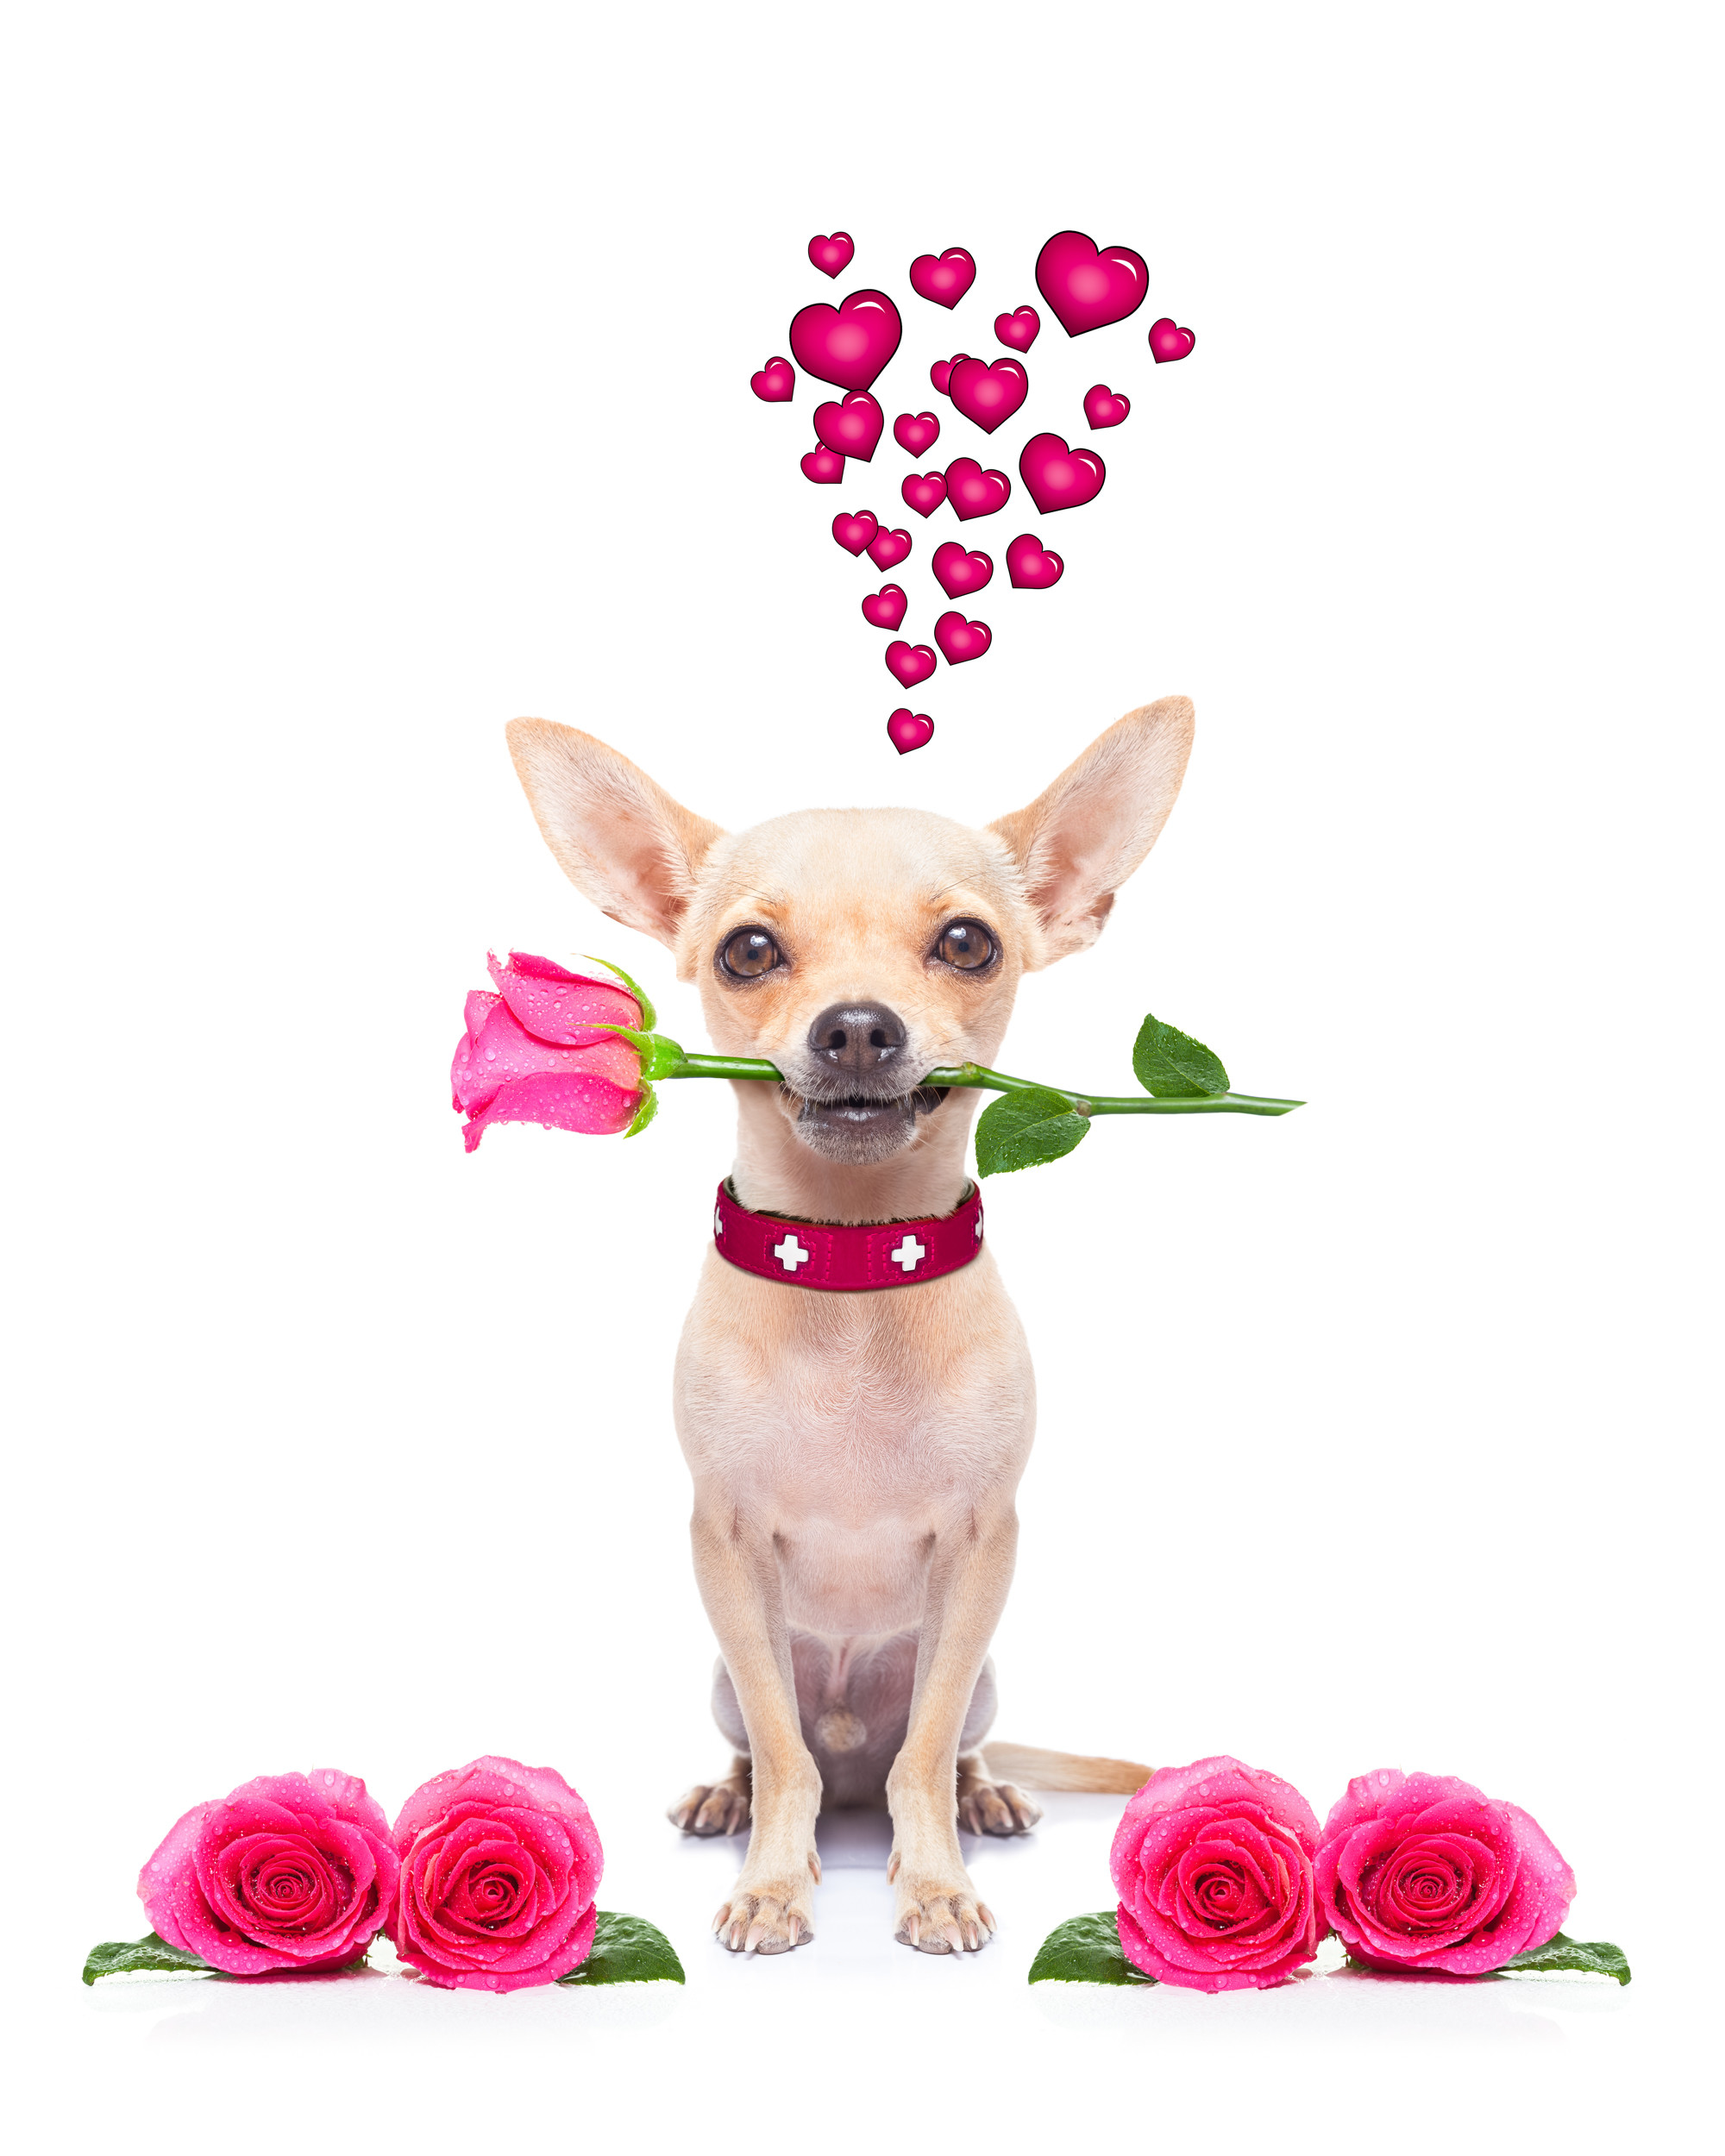 dog, flowers, valentines day